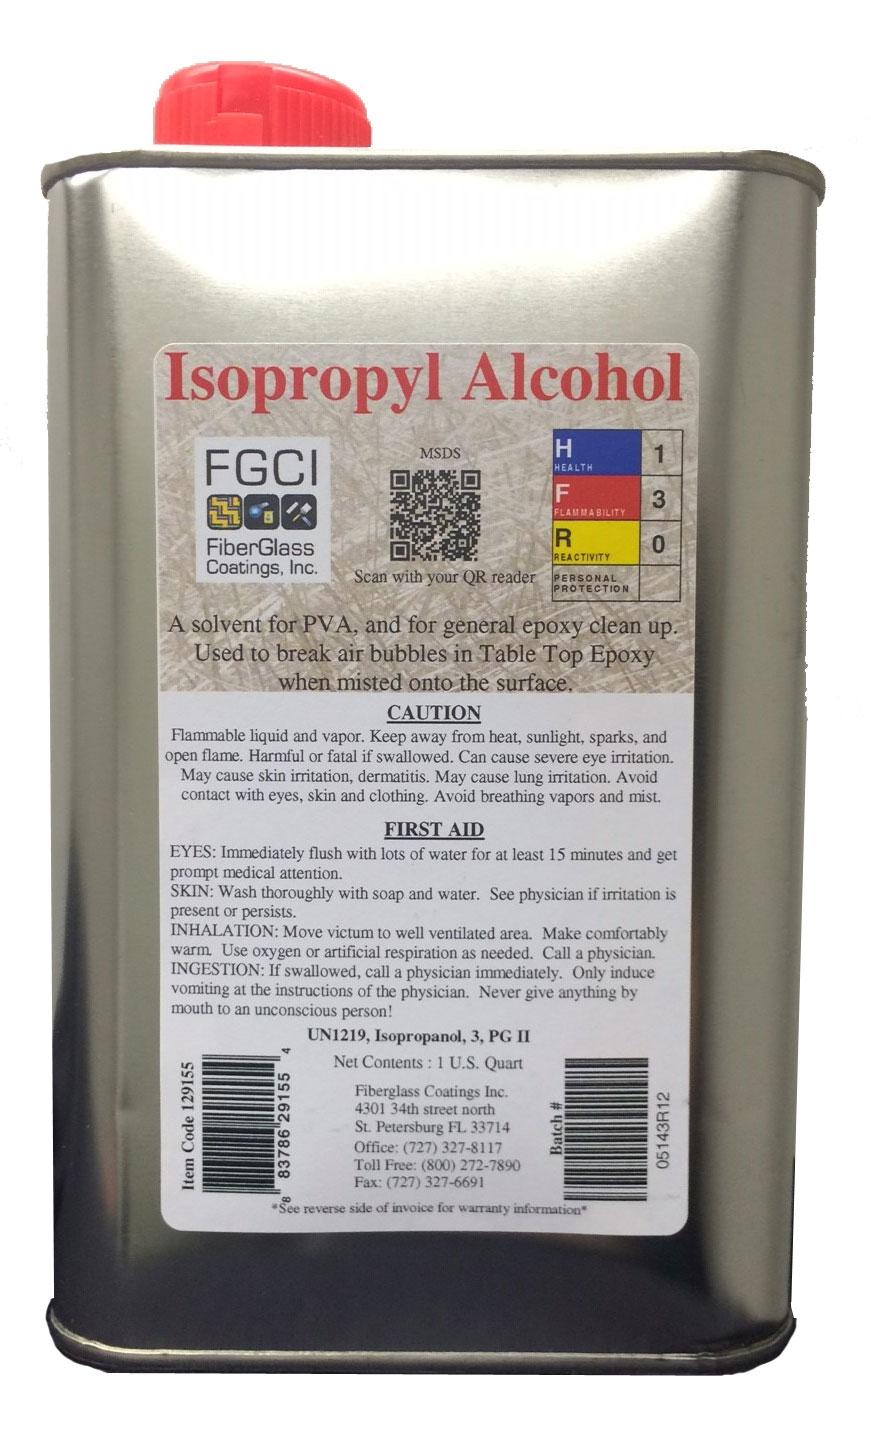 acetone – Fiberglass Coatings